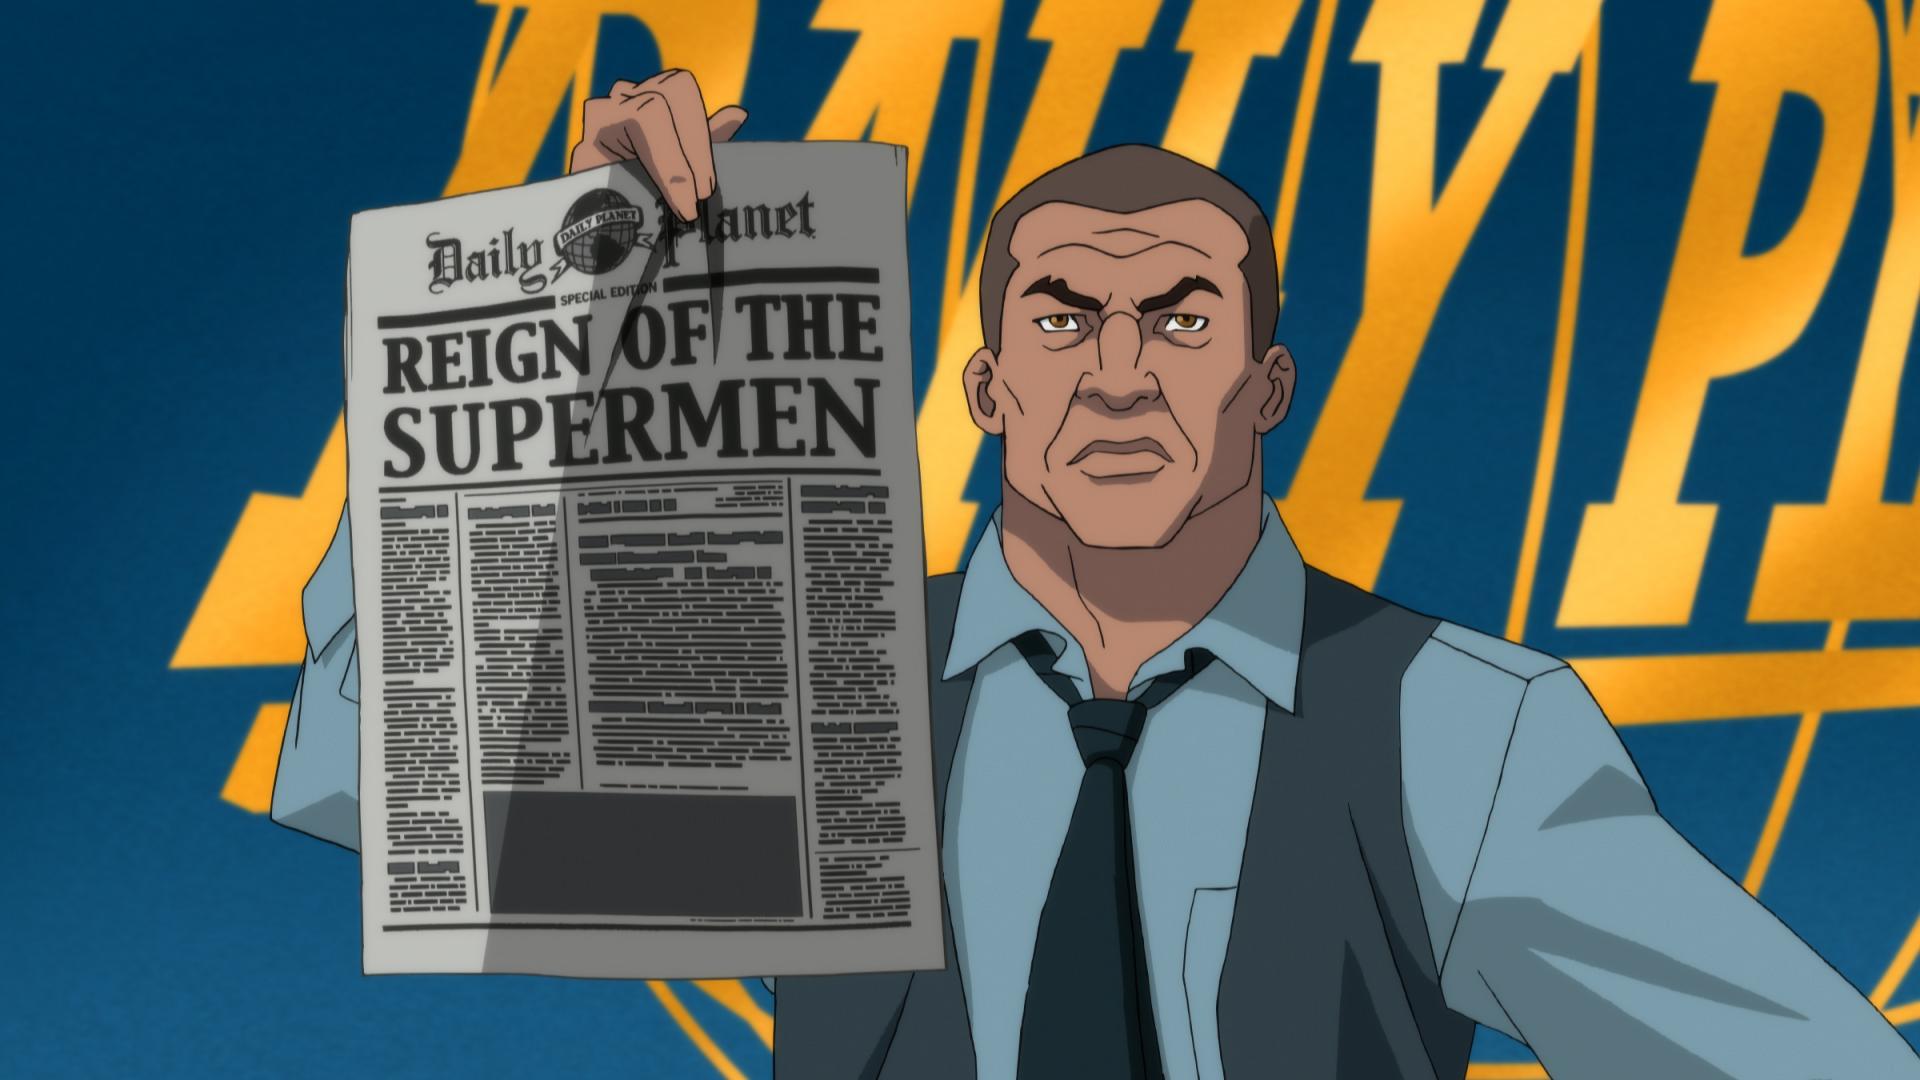 REIGN OF THE SUPERMEN a Cinematic Debut Fathom Event